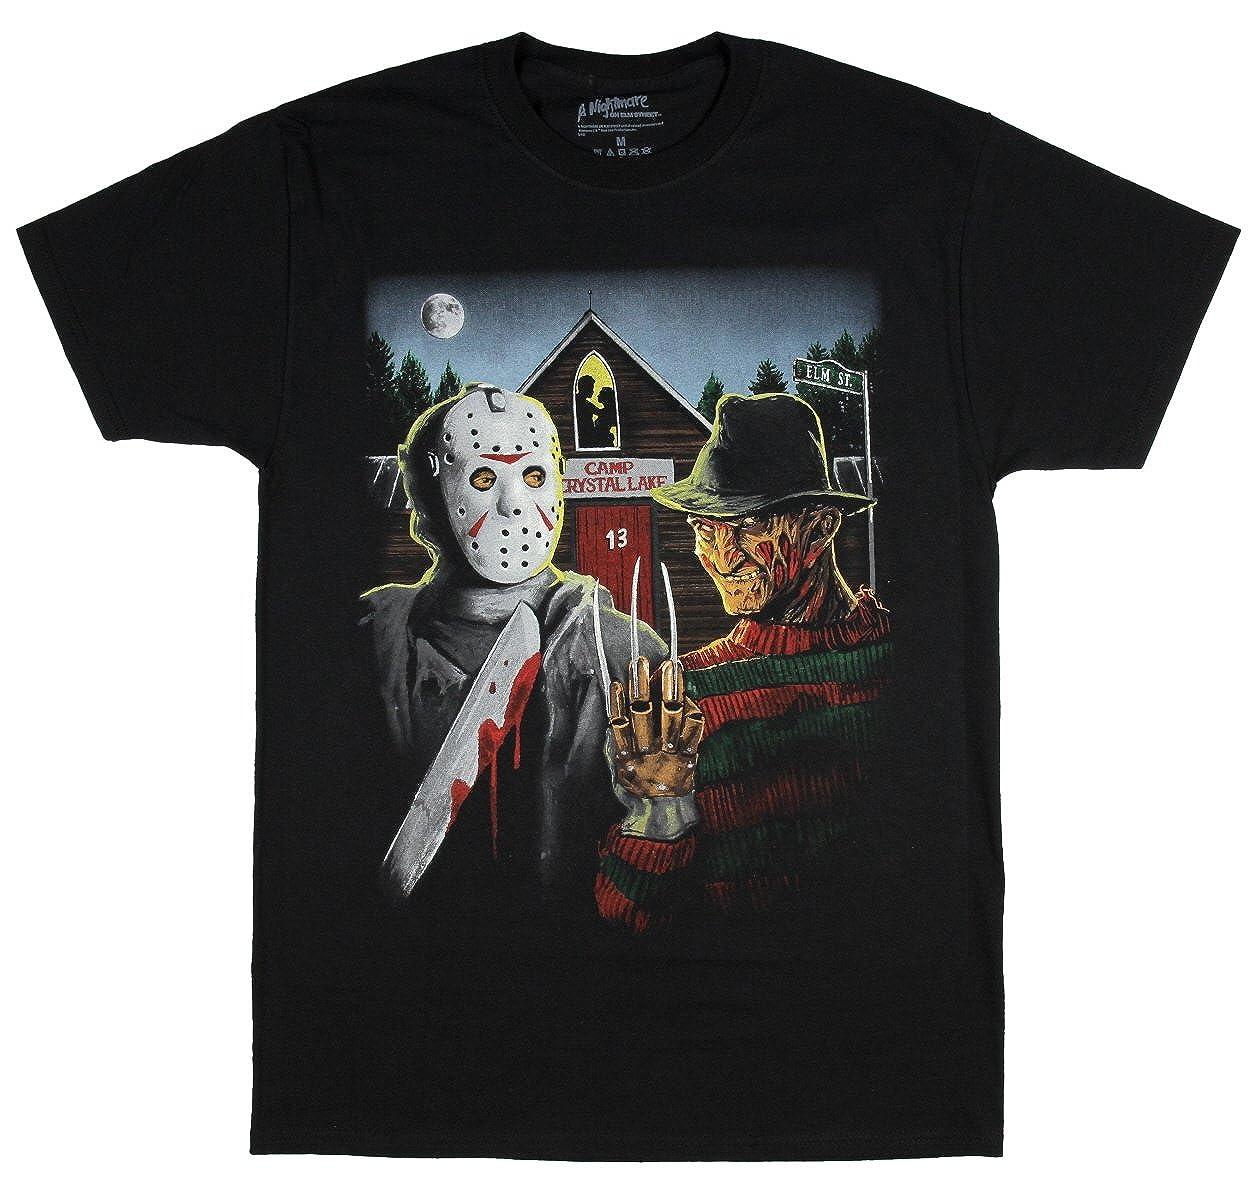 Fashion A Nightmare On Elm Street Freddy Krueger & Jason Graphic T-shirt